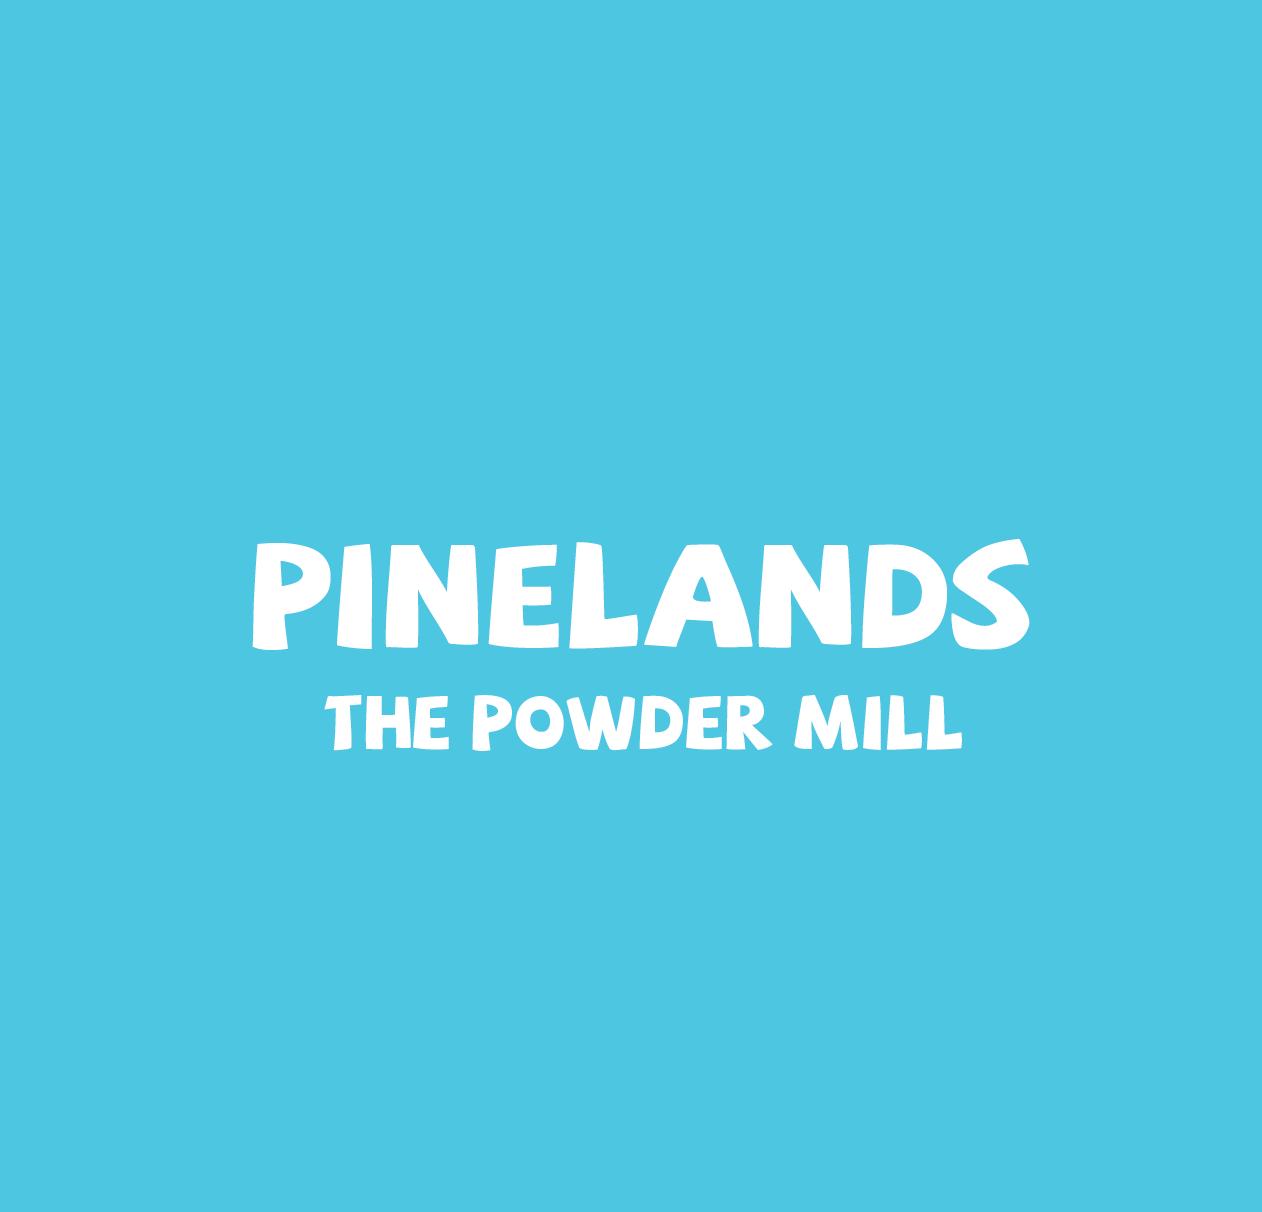 Pinelands Pool 3-02.png